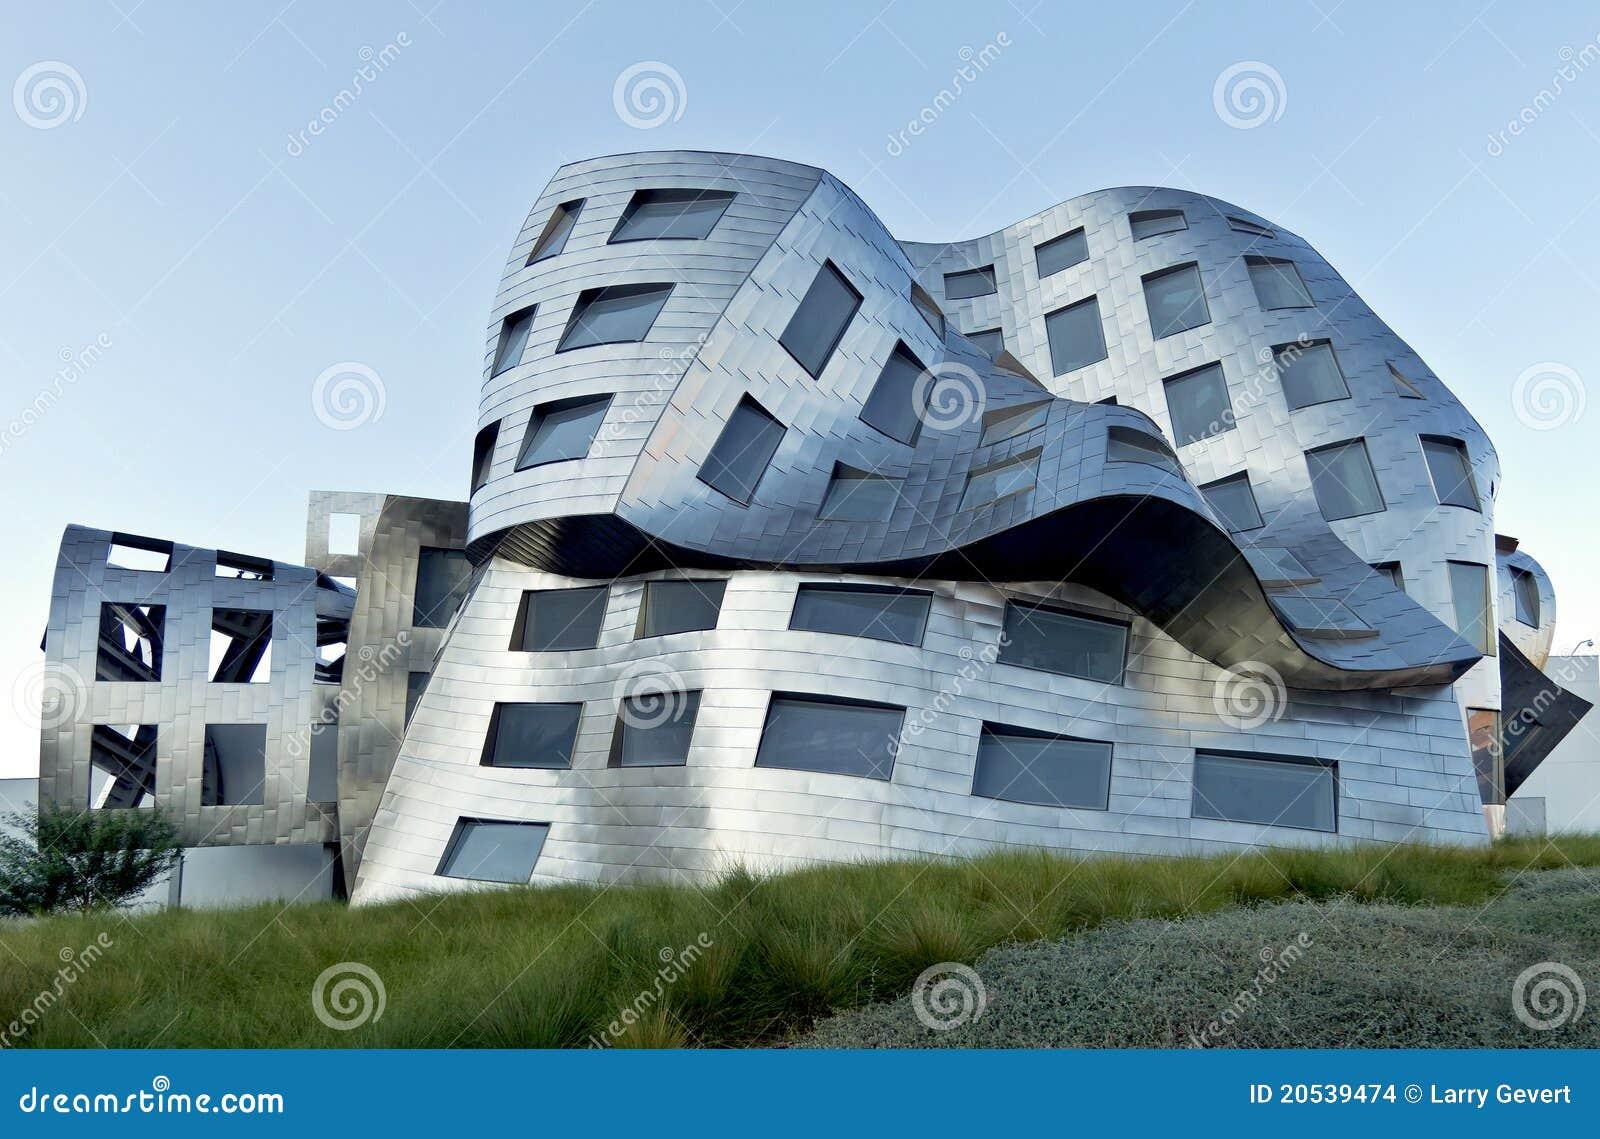 bizarre architectuur in las vegas redactionele stock afbeelding afbeelding 20539474. Black Bedroom Furniture Sets. Home Design Ideas